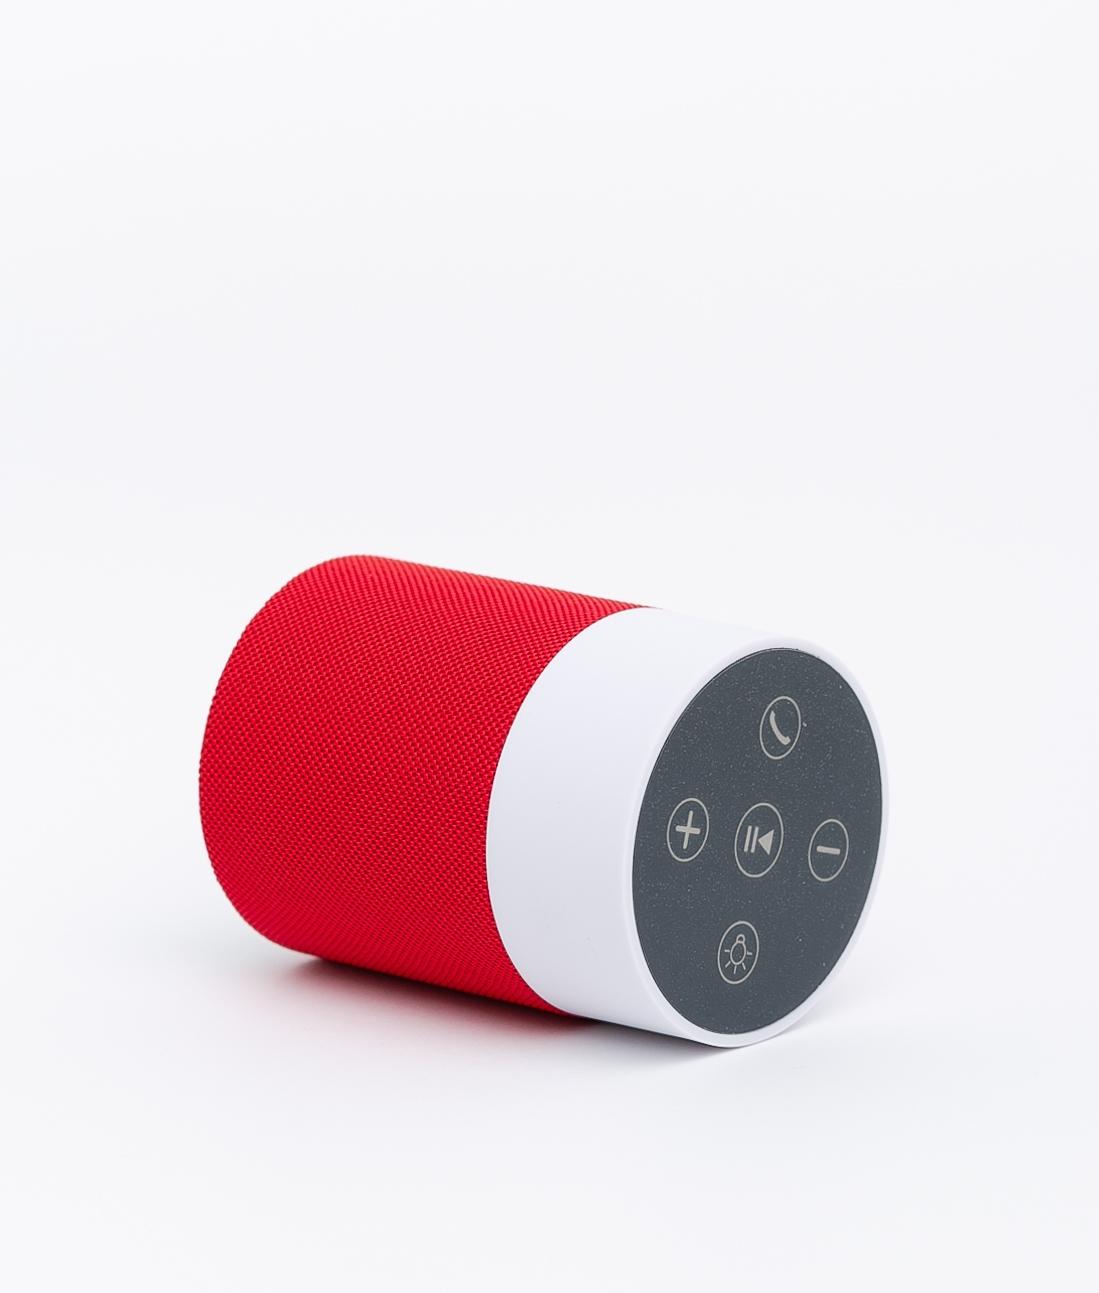 Altoparlante Bluetooth Abacus - Rosso